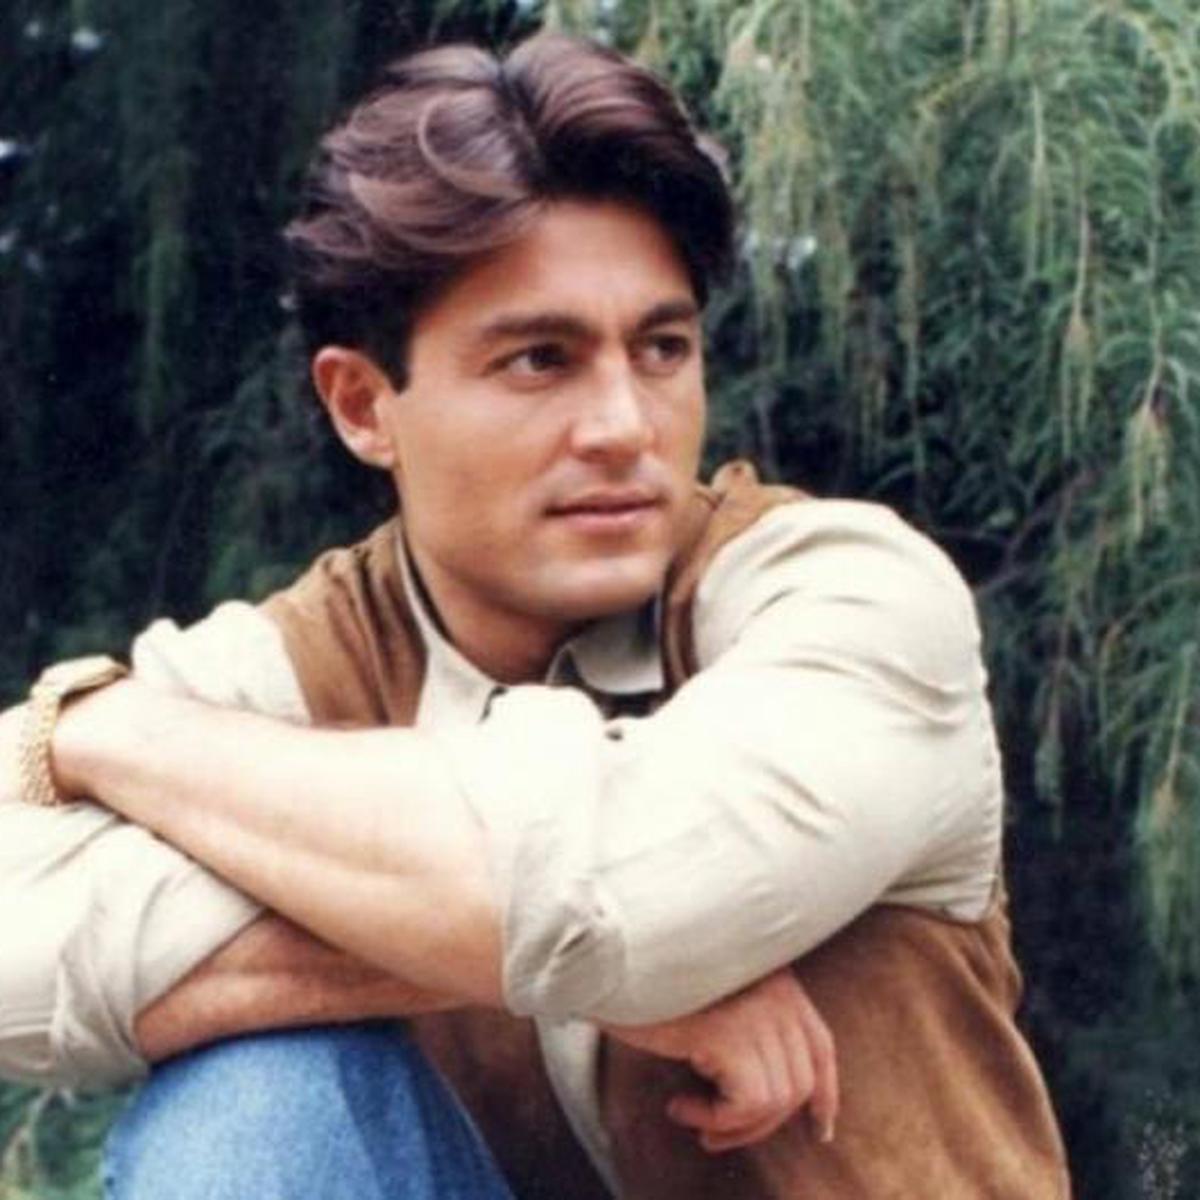 Los inicios de Fernando Colunga: la vez que trabajó como doble de Eduardo  Yáñez | actor | Mexico | Adela Noriega | Telenovelas nnda nnlt |  CELEBRITIES | TROME